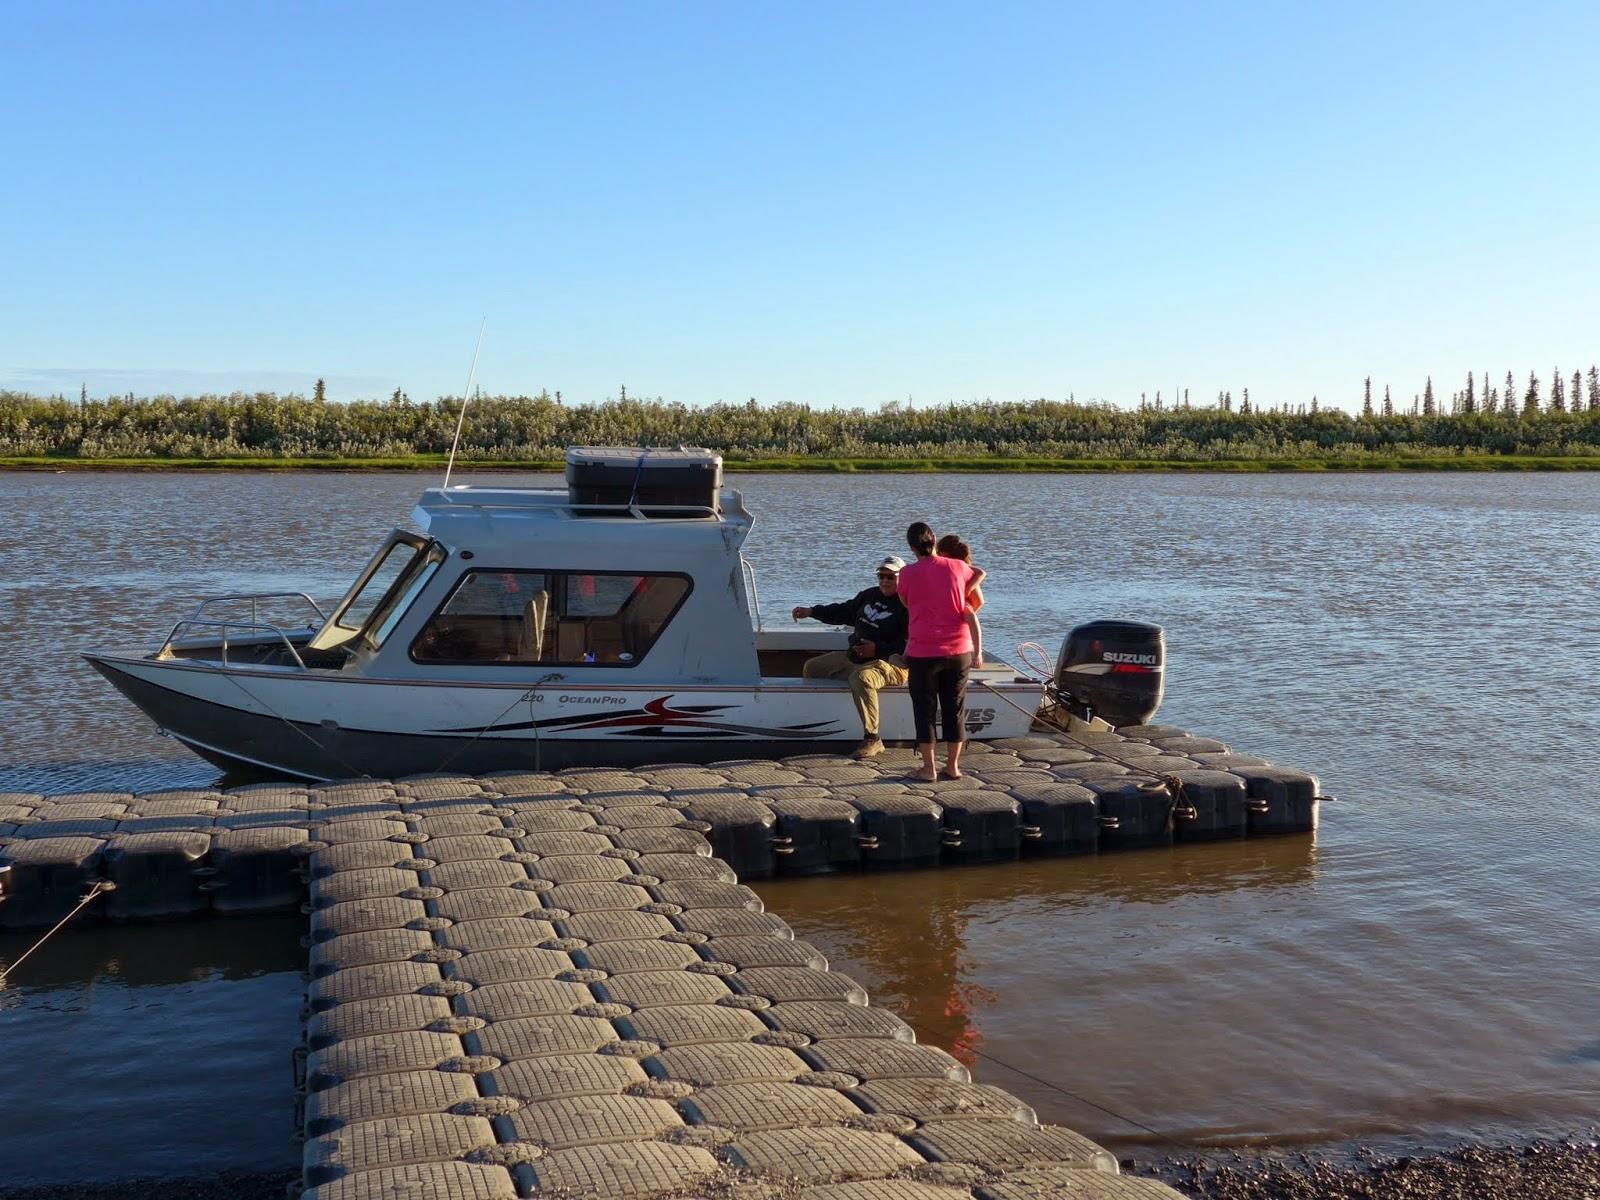 Boat docked.